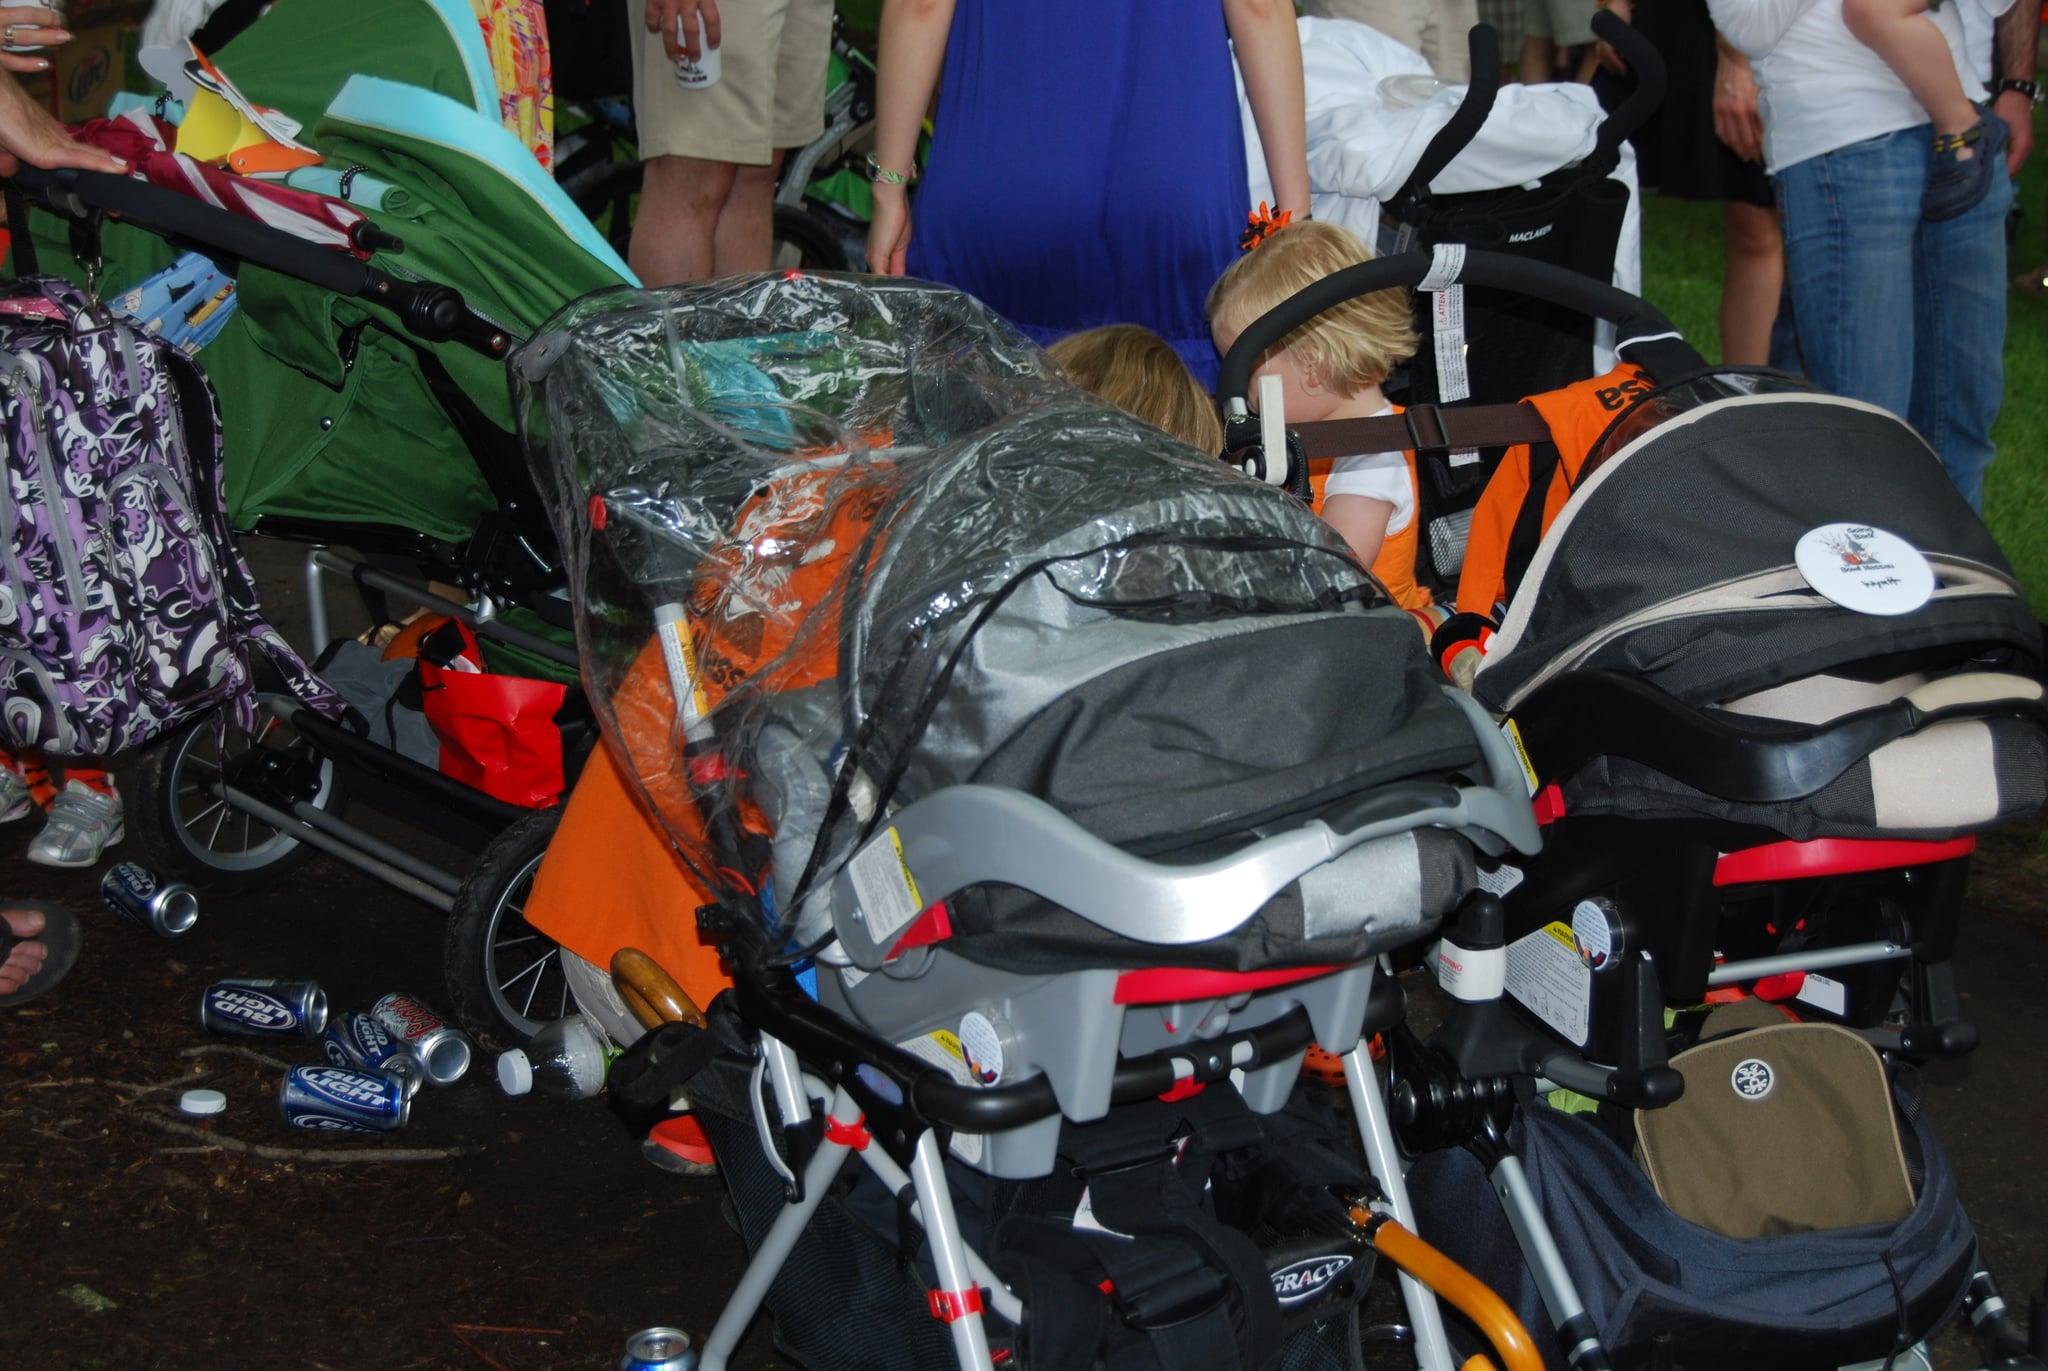 The stroller parking lot.